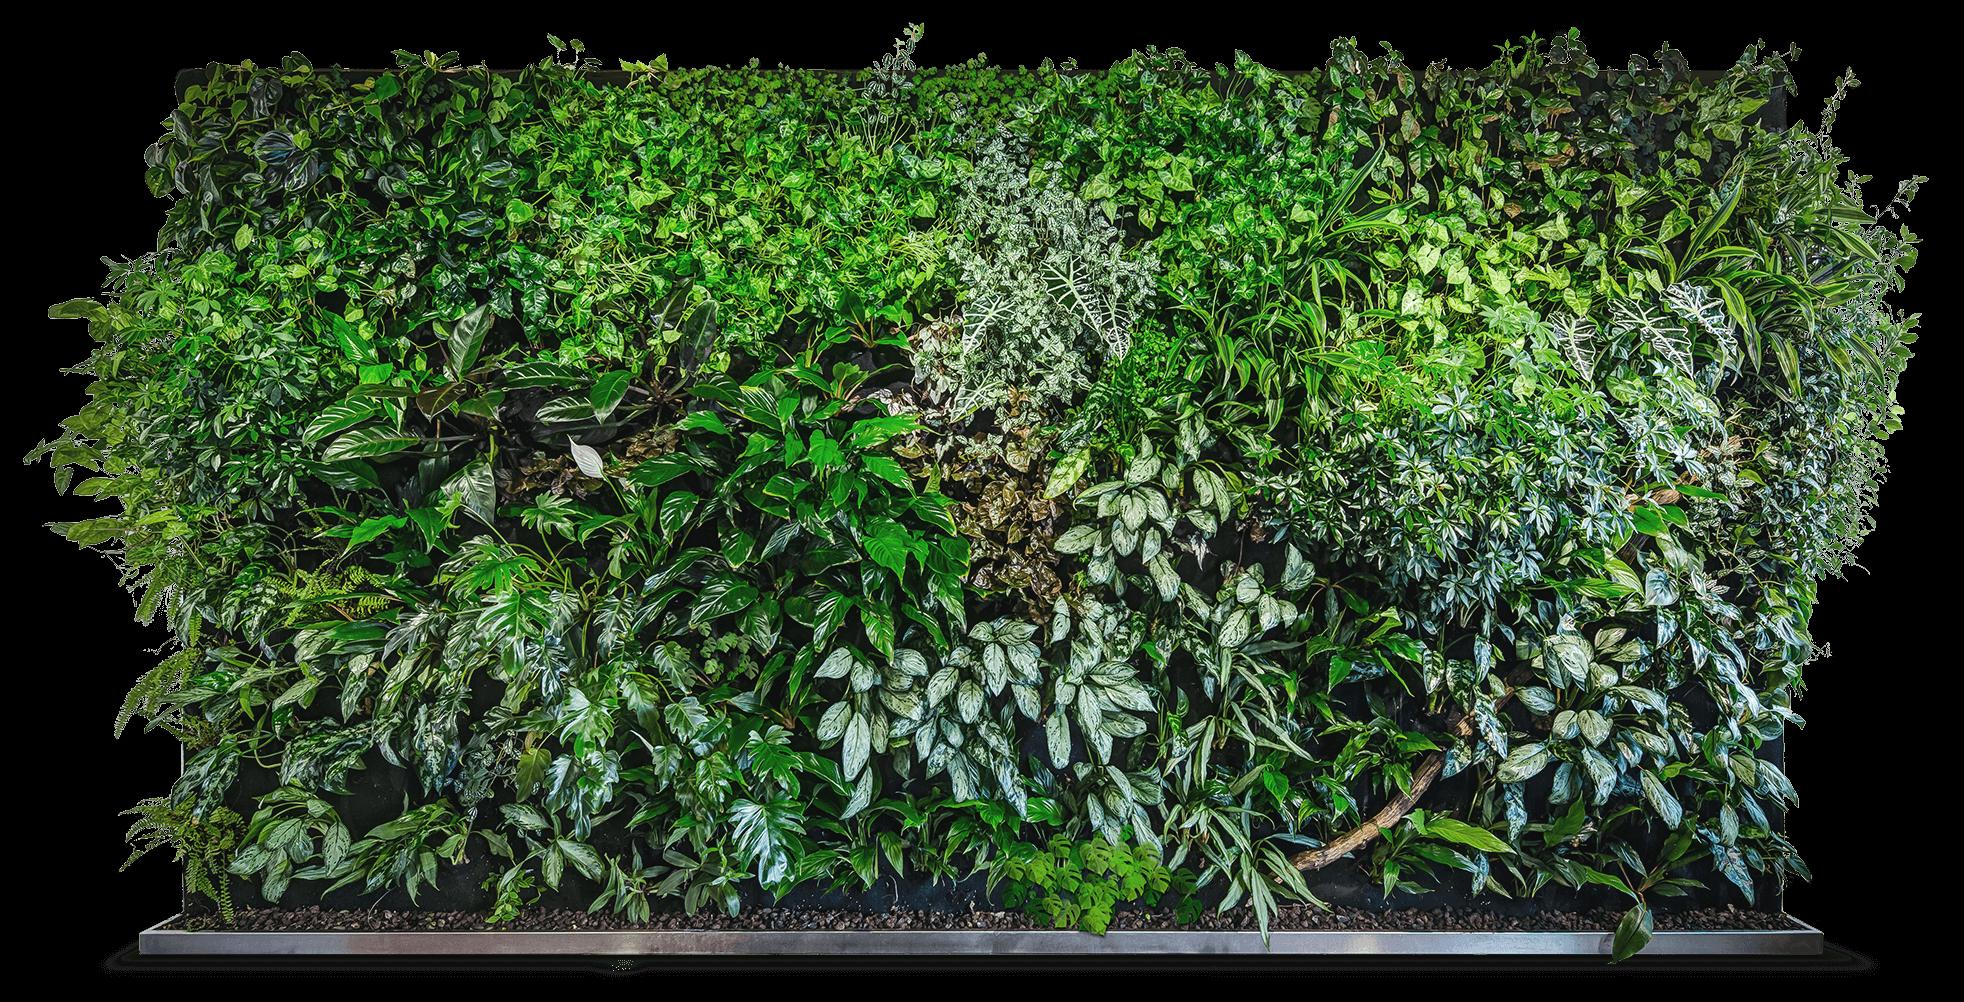 Green Wall Photoshop In 2021 Green Wall Backyard Garden Design Green Wall Design